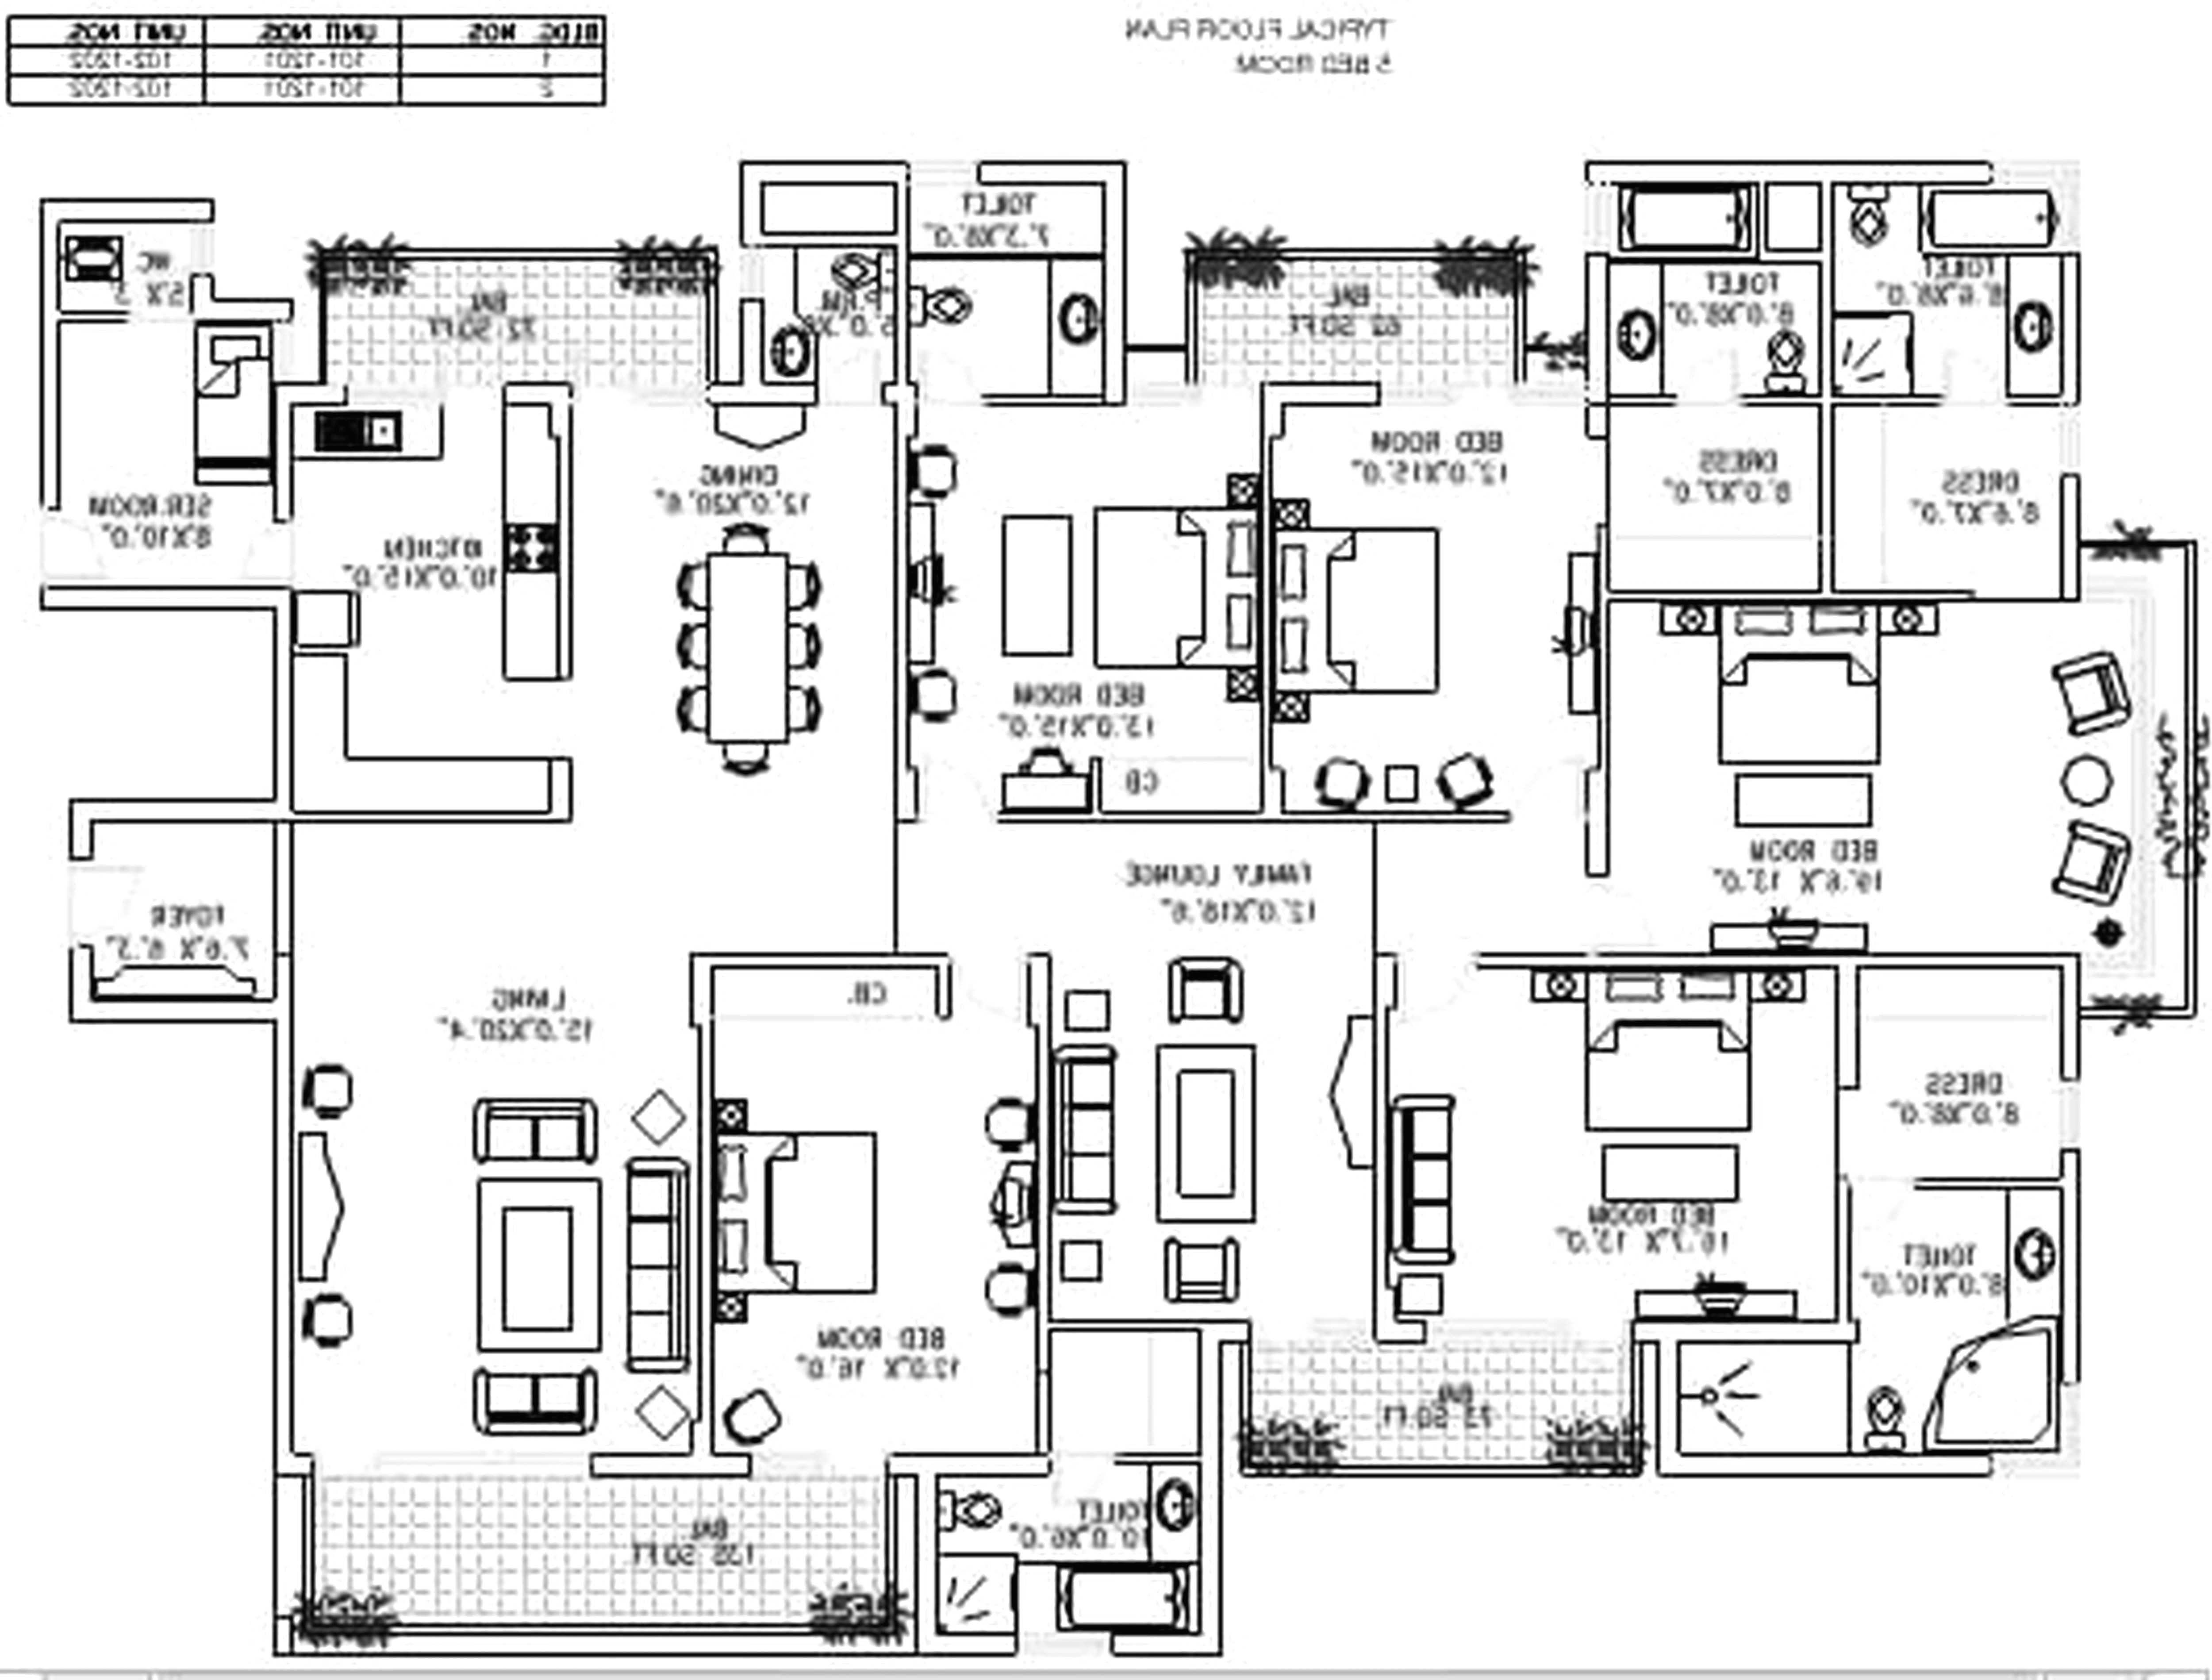 Mansion Huge Minecraft House Ideas Inspirational Huge Mansion Floor Plans Unique Inspir Luxury House Plans Minecraft Modern House Blueprints Modern House Plans